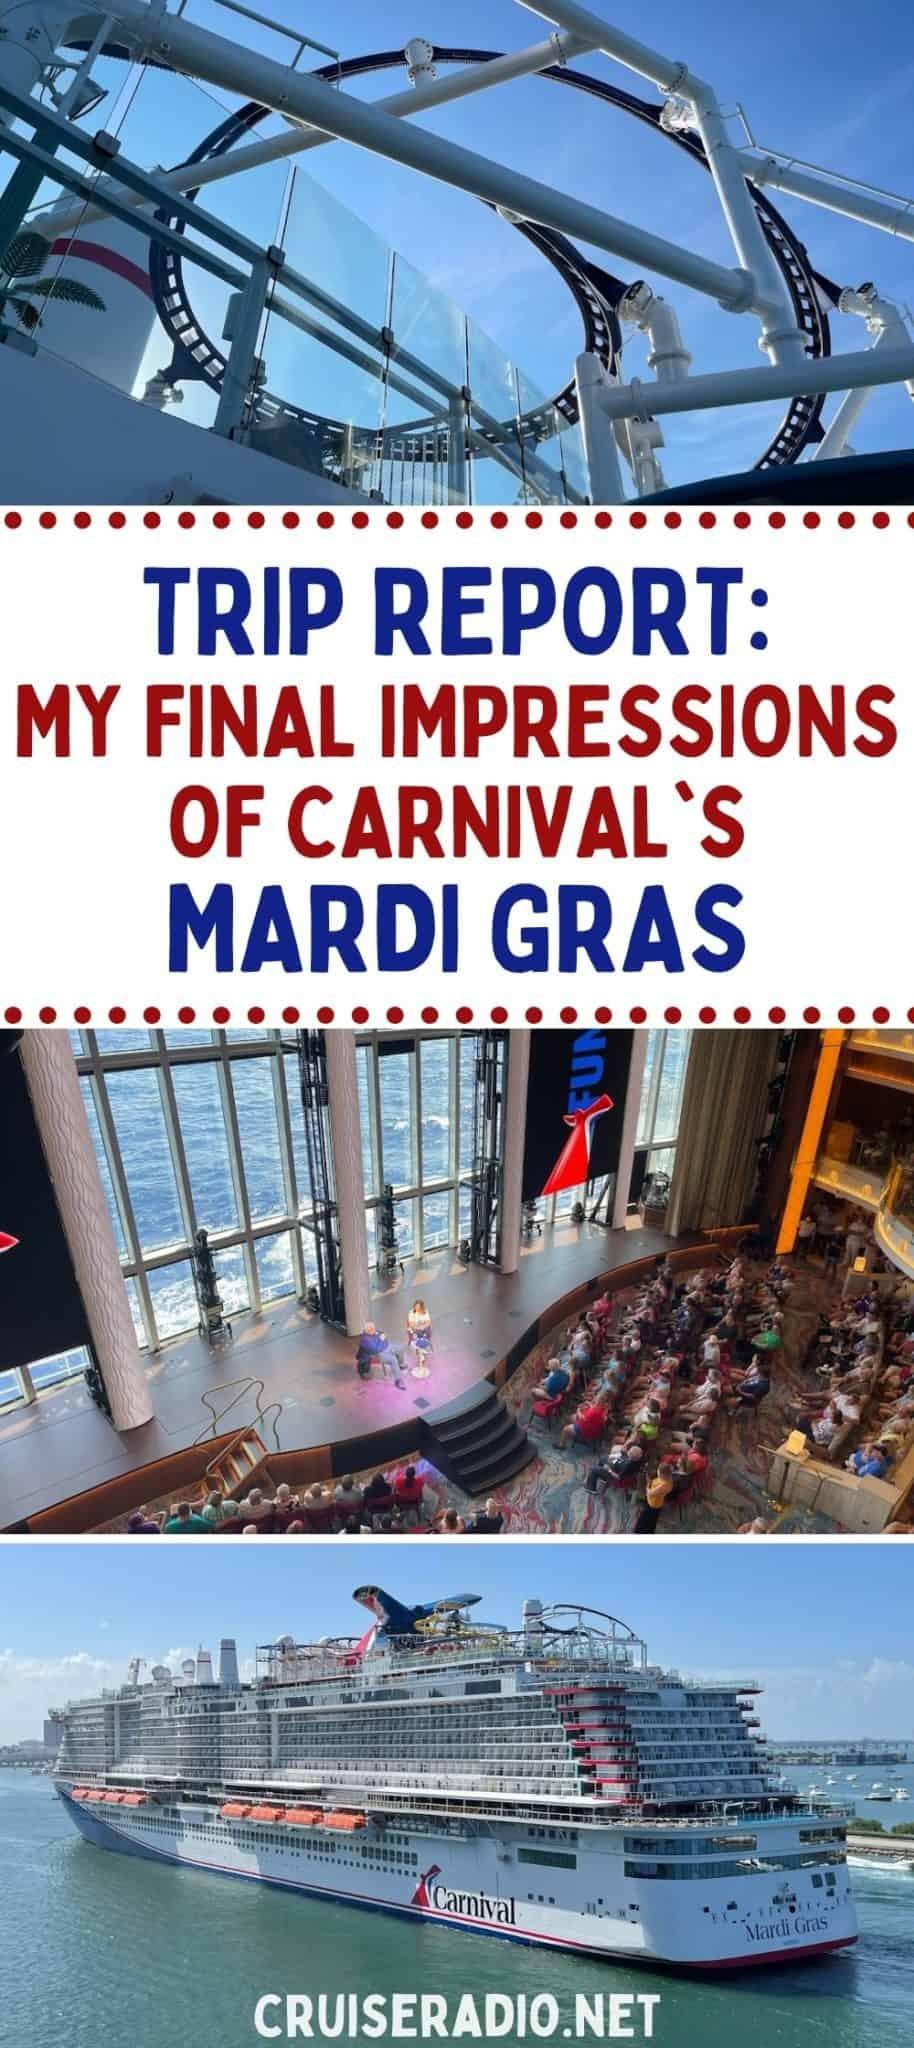 trip report: my final impressions of carnival's mardi gras